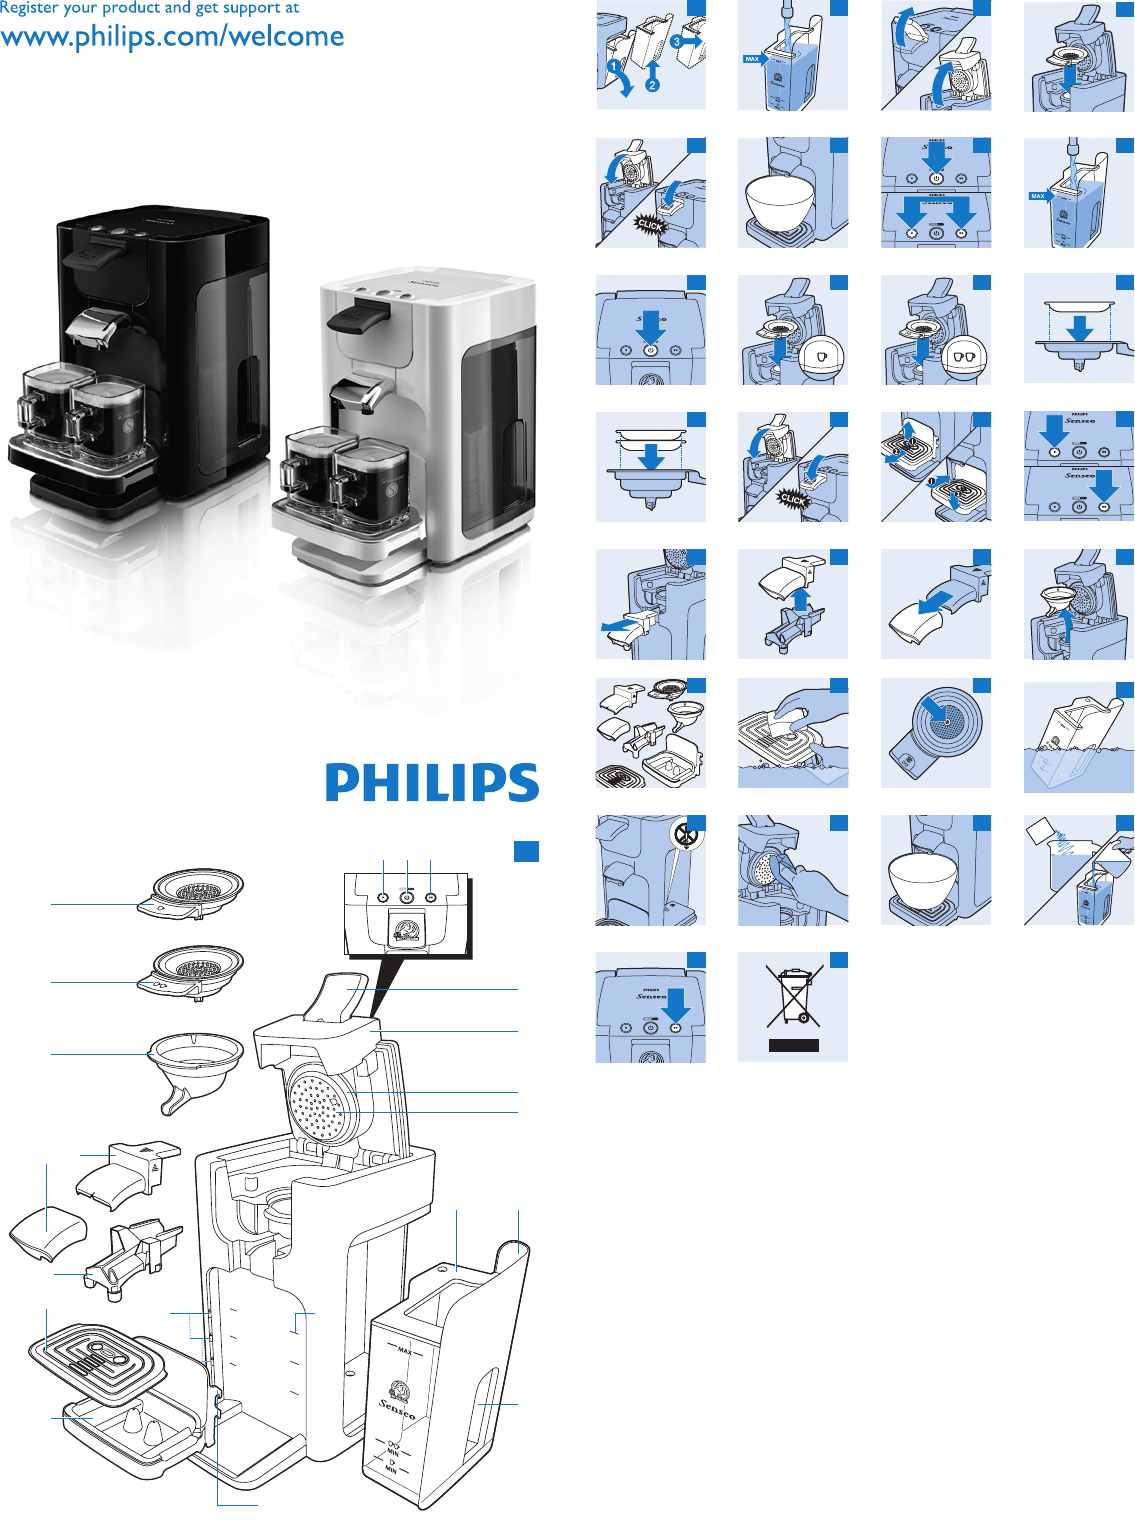 Extreem Handleiding Philips hd 7860 senseo quadrante (pagina 1 van 9 DN26